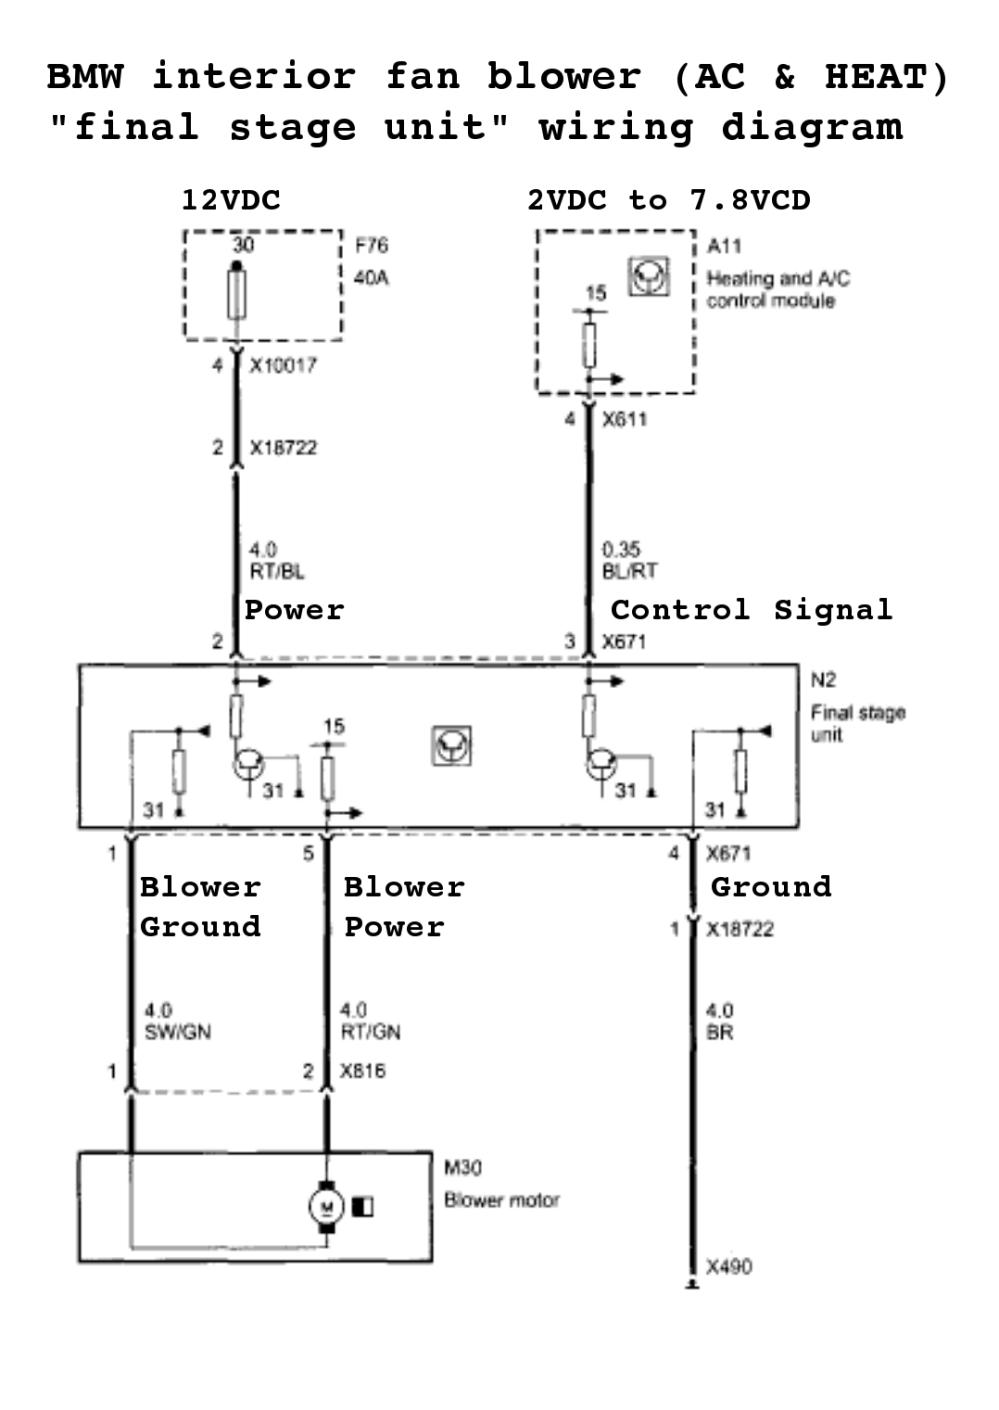 medium resolution of bmw blower motor wiring diagram wiring diagram bmw blower motor wiring diagram